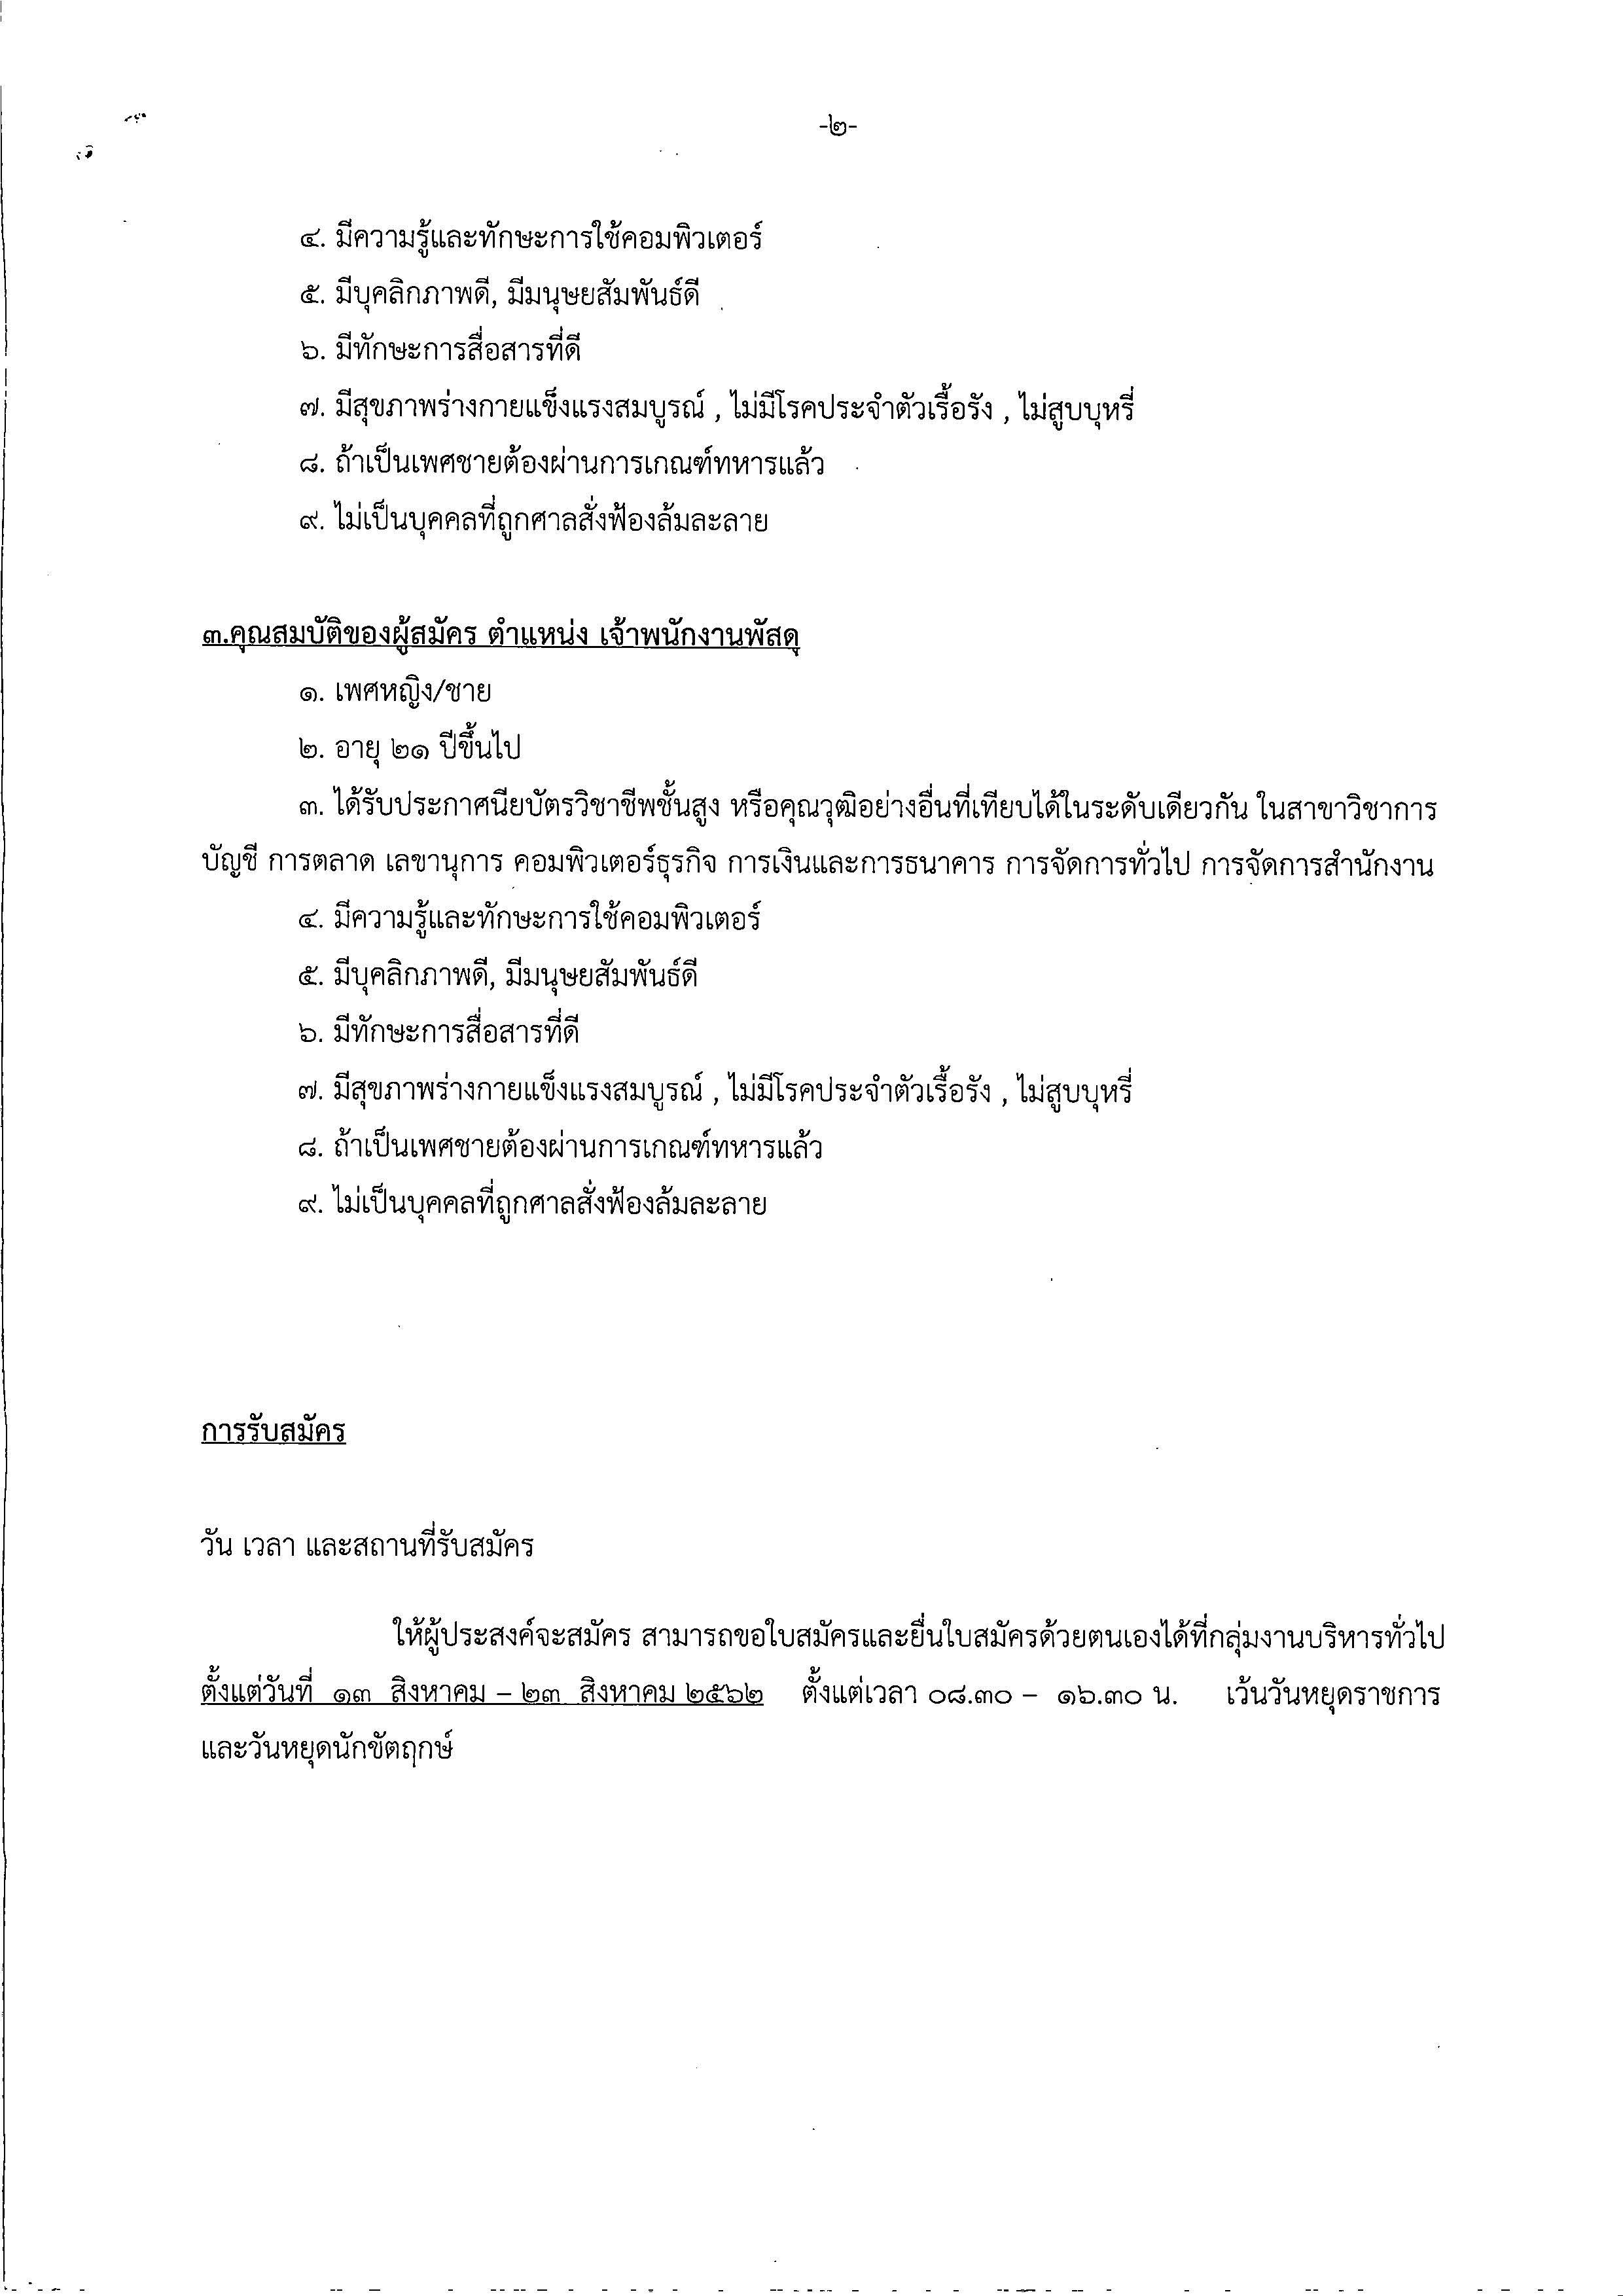 job620815_2